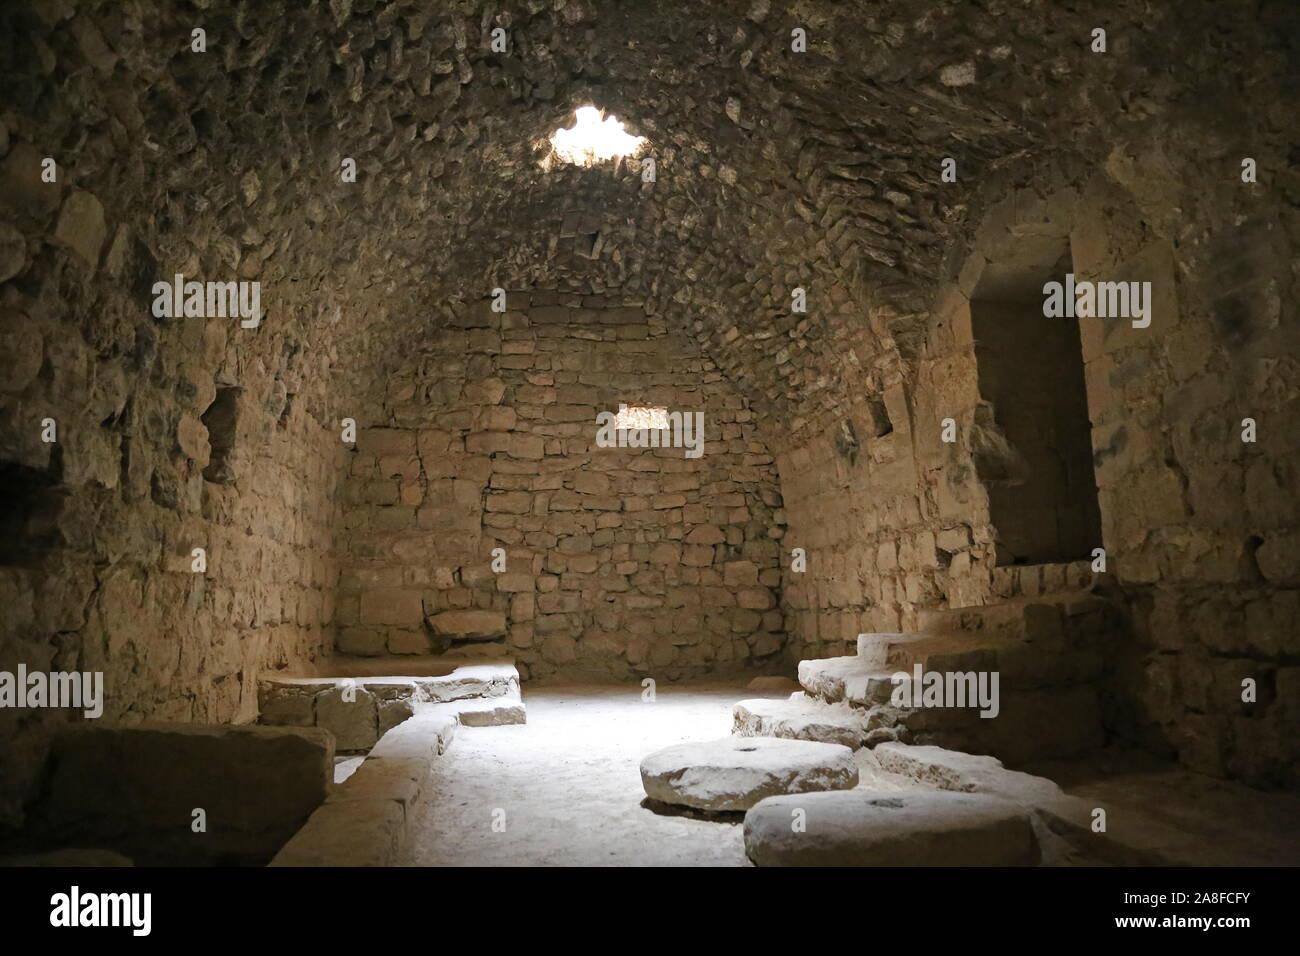 Kitchen, Karak Castle, Al Karak, Karak Governorate, Jordan, Middle East Stock Photo